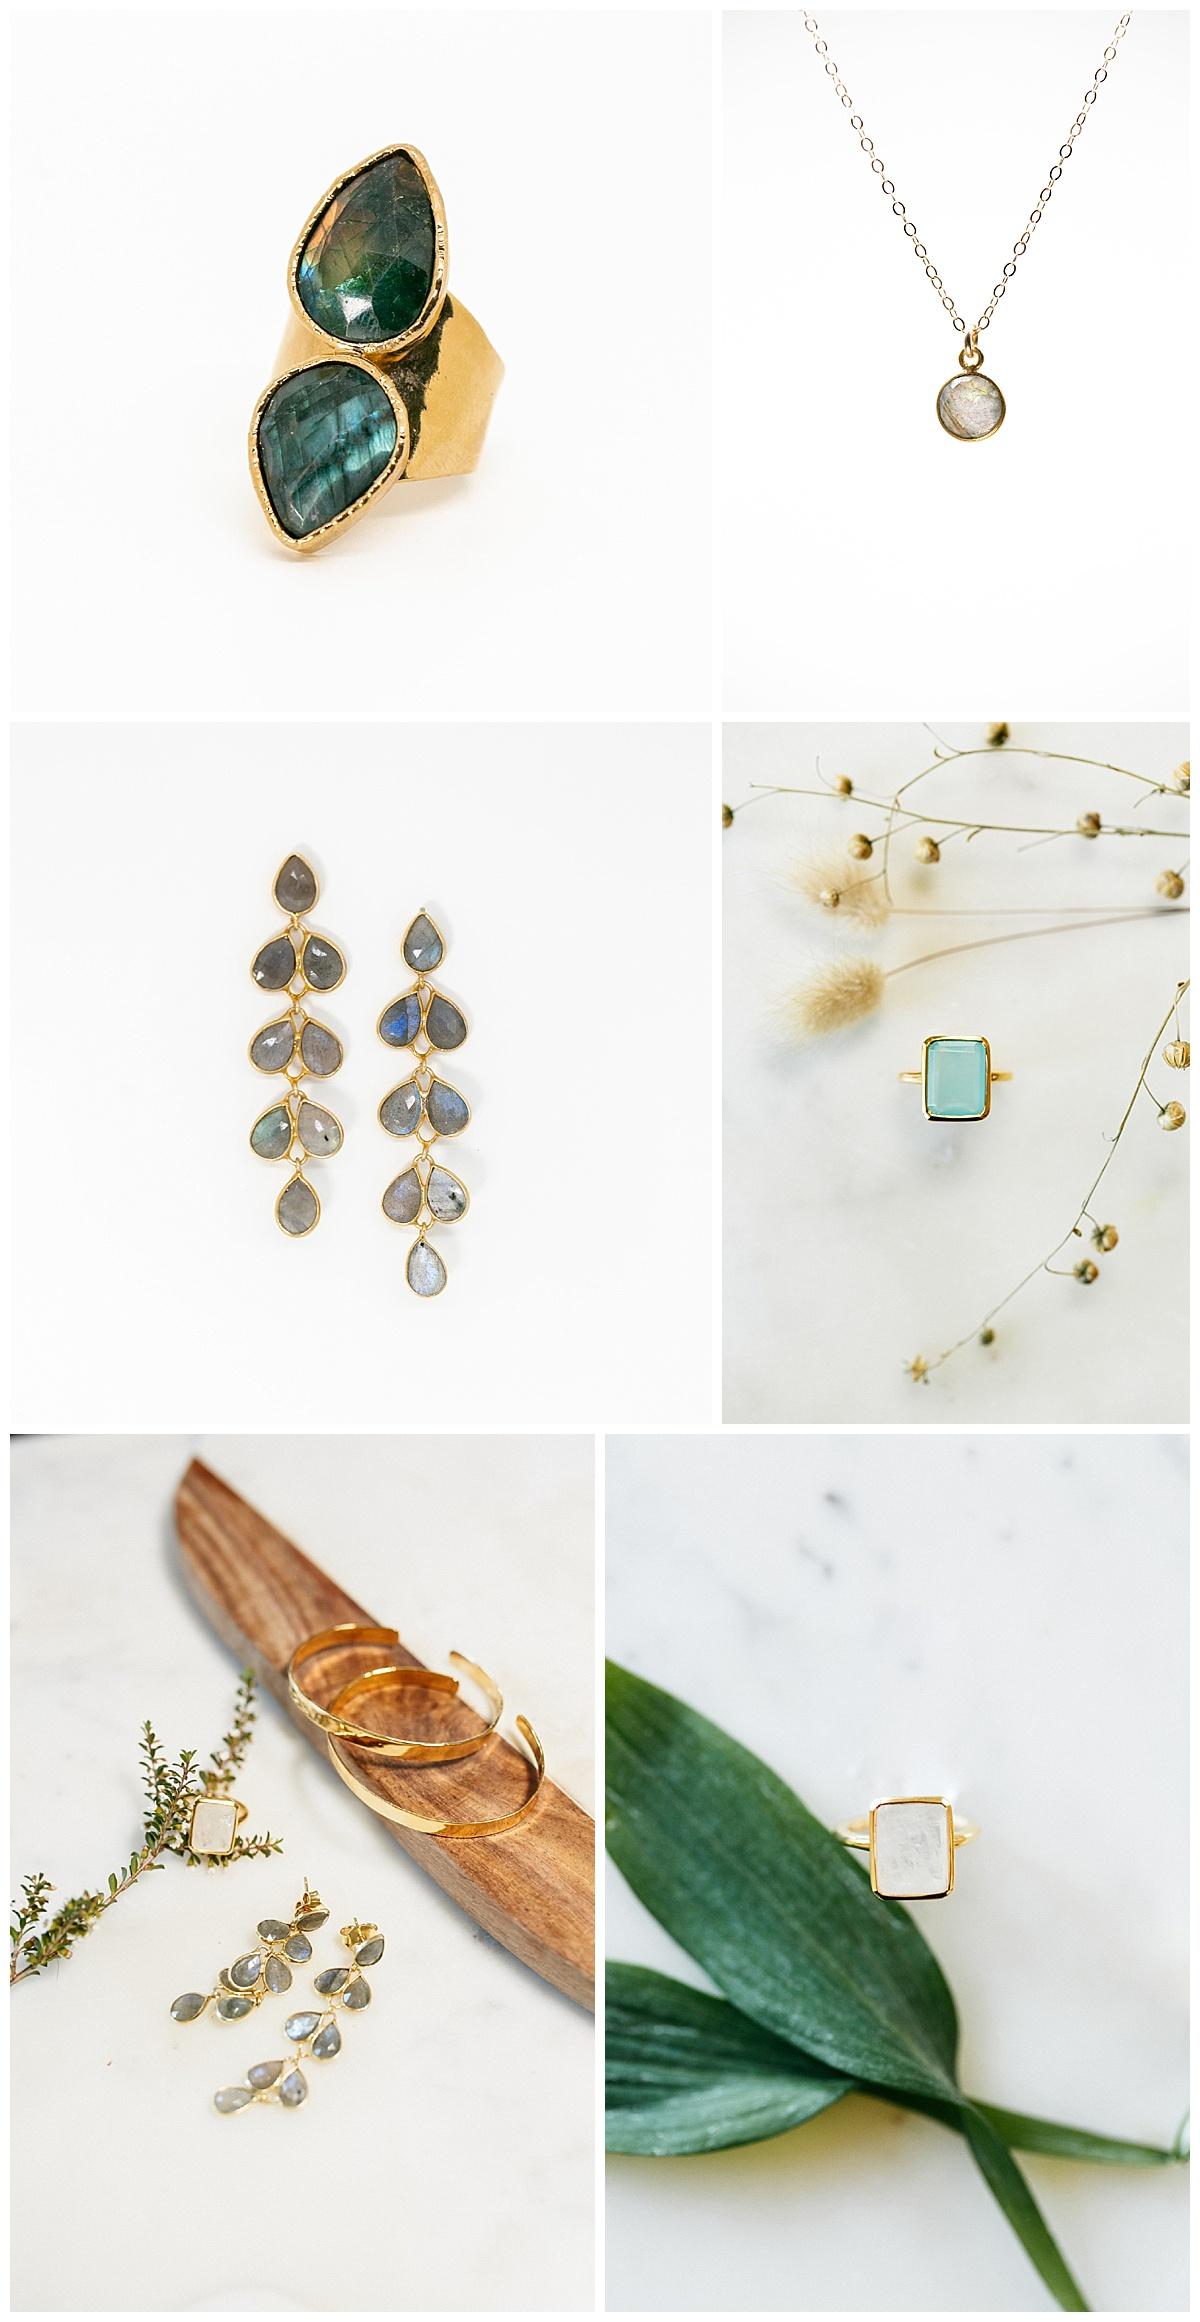 SamErica Studios - branding photography for jewelry - wedding detail shots - wedding jewelry - teal and blue wedding